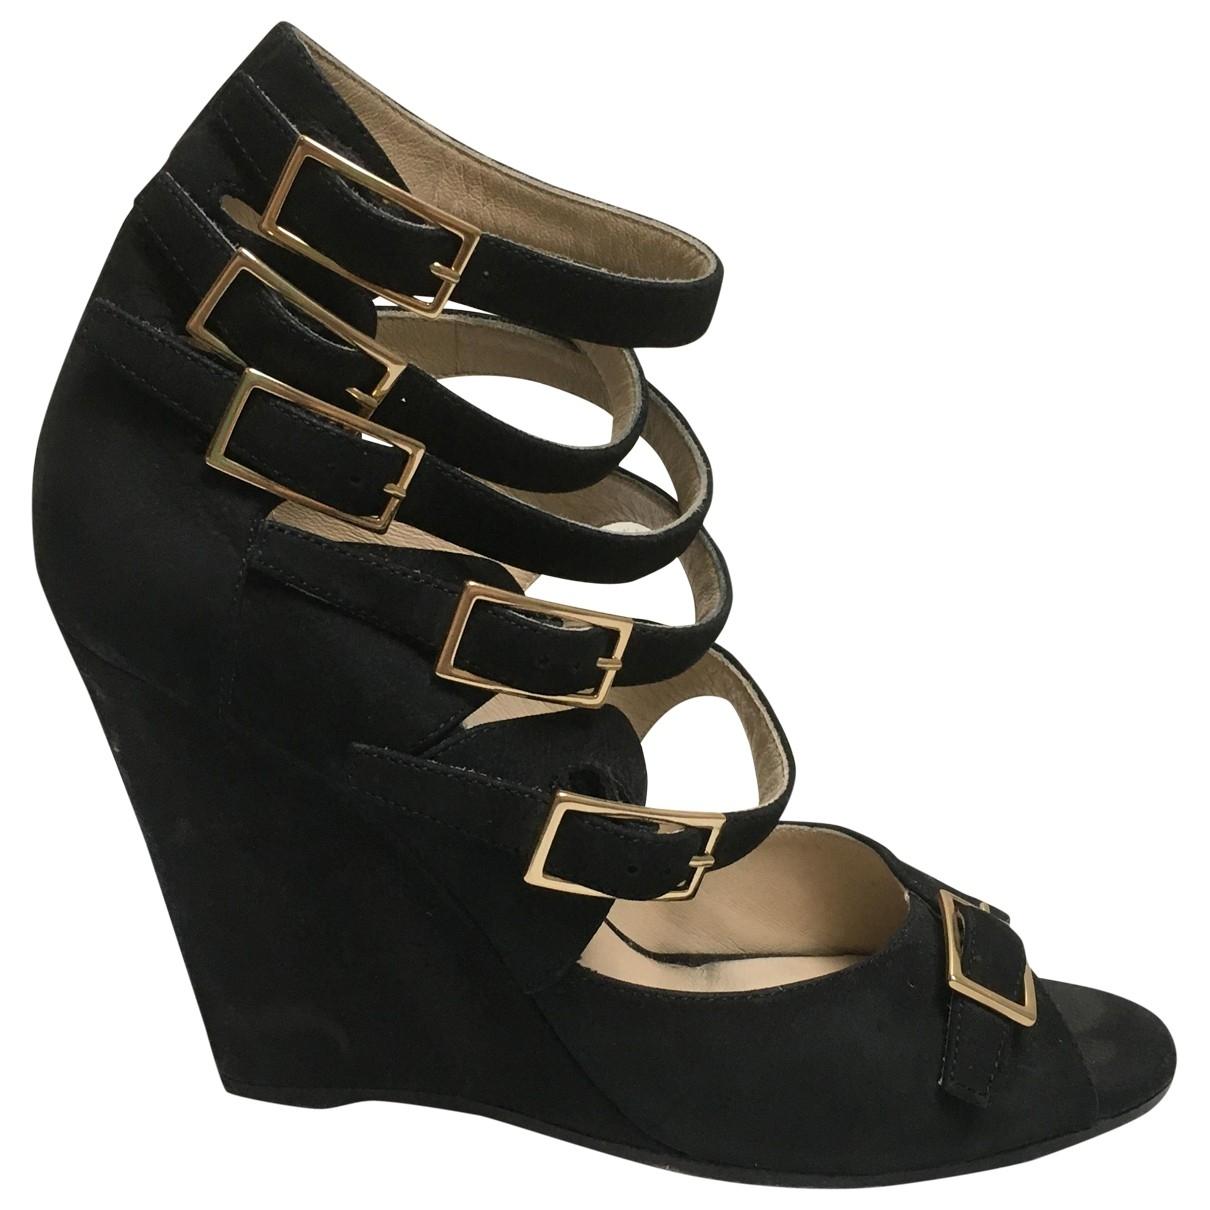 Chloé \N Black Leather Sandals for Women 36.5 EU